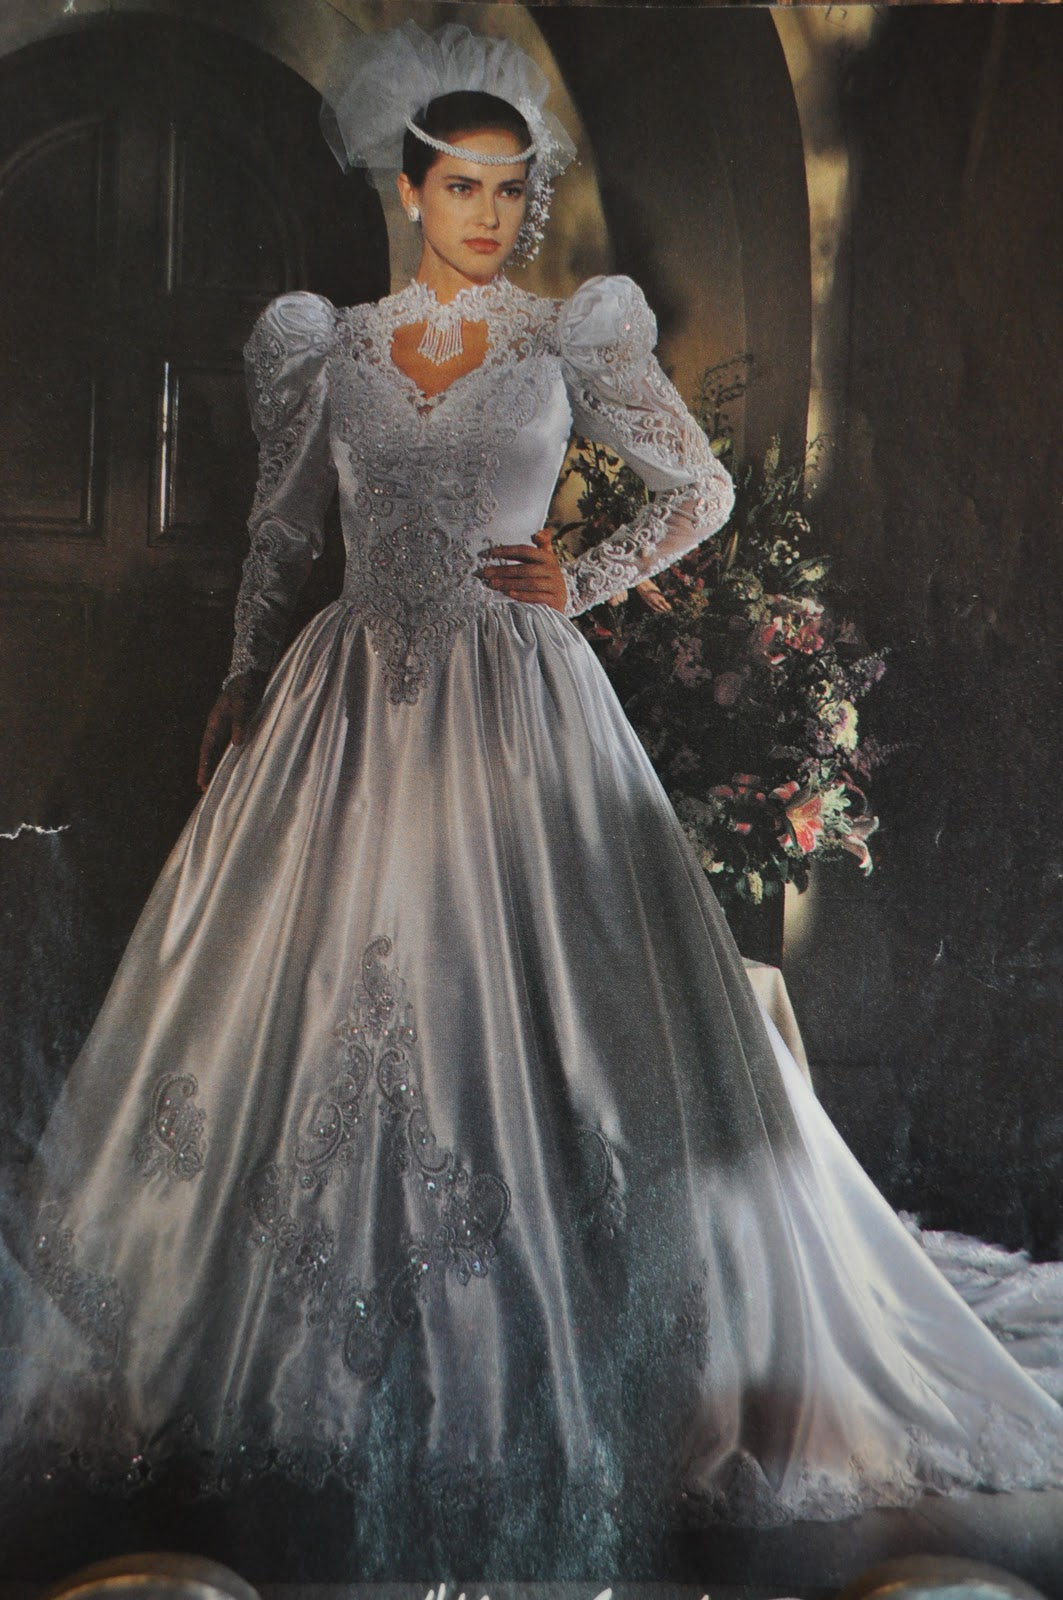 Celebrity Wedding Dresses 1990s : The further adventures of abby hayden s wedding dresses